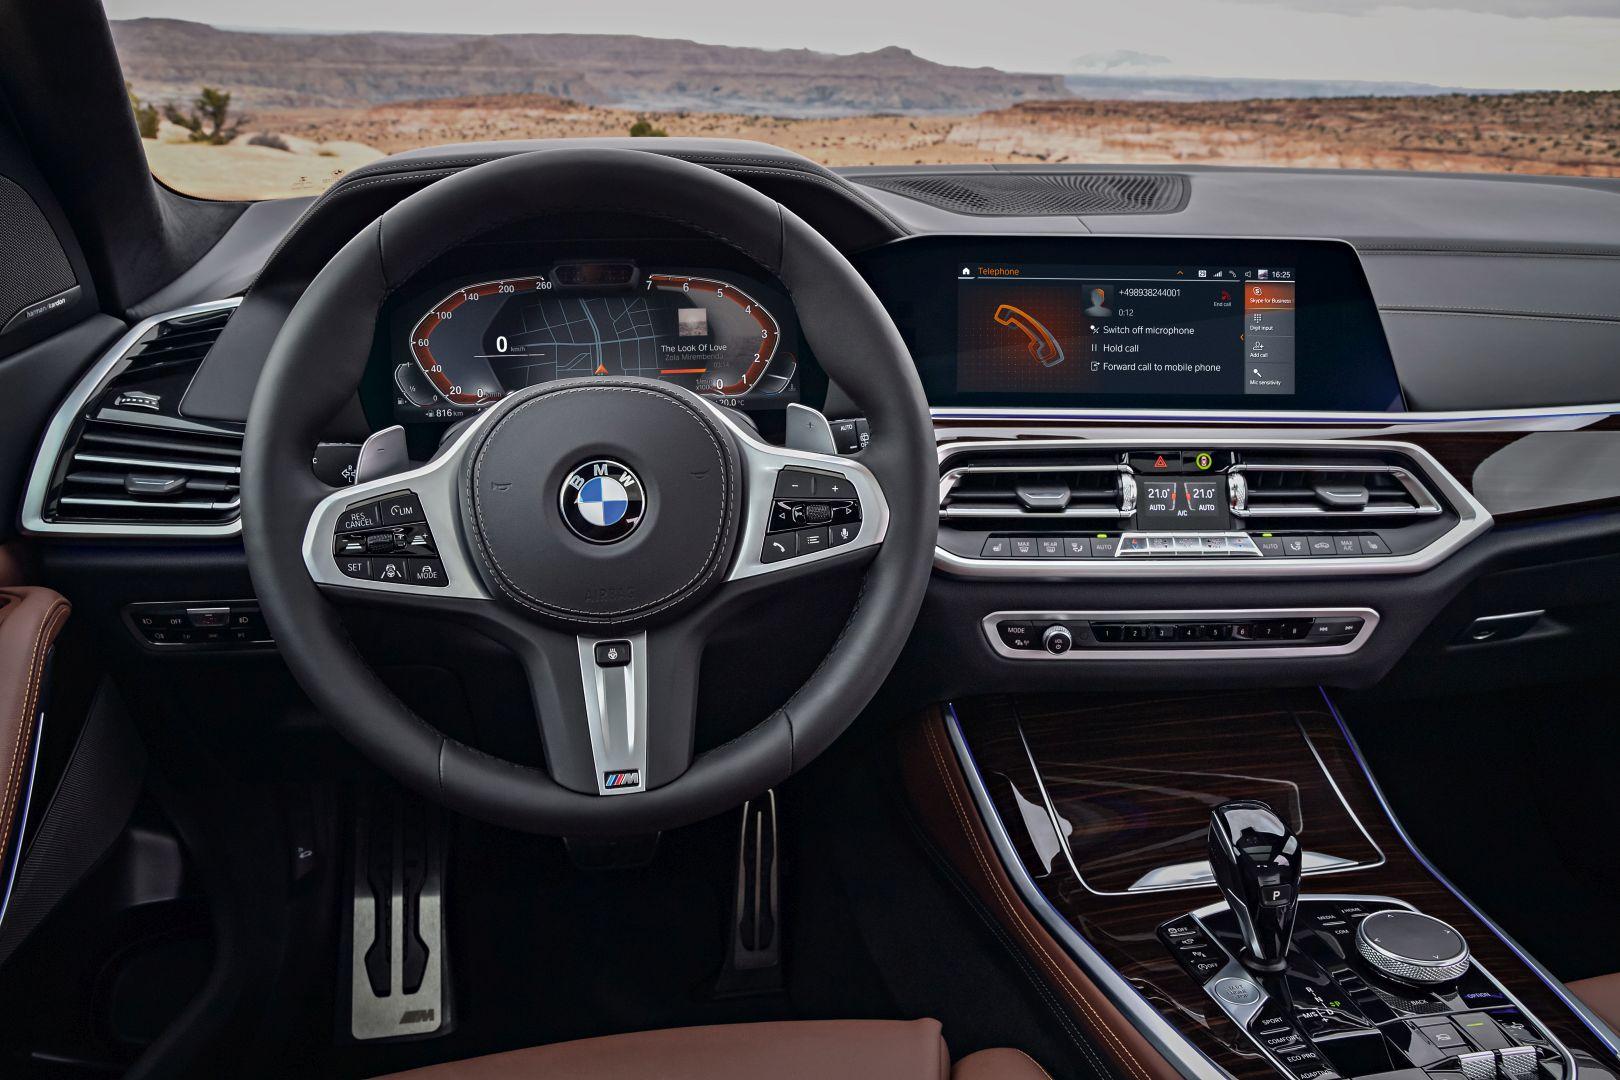 BMW Live Cockpit 3